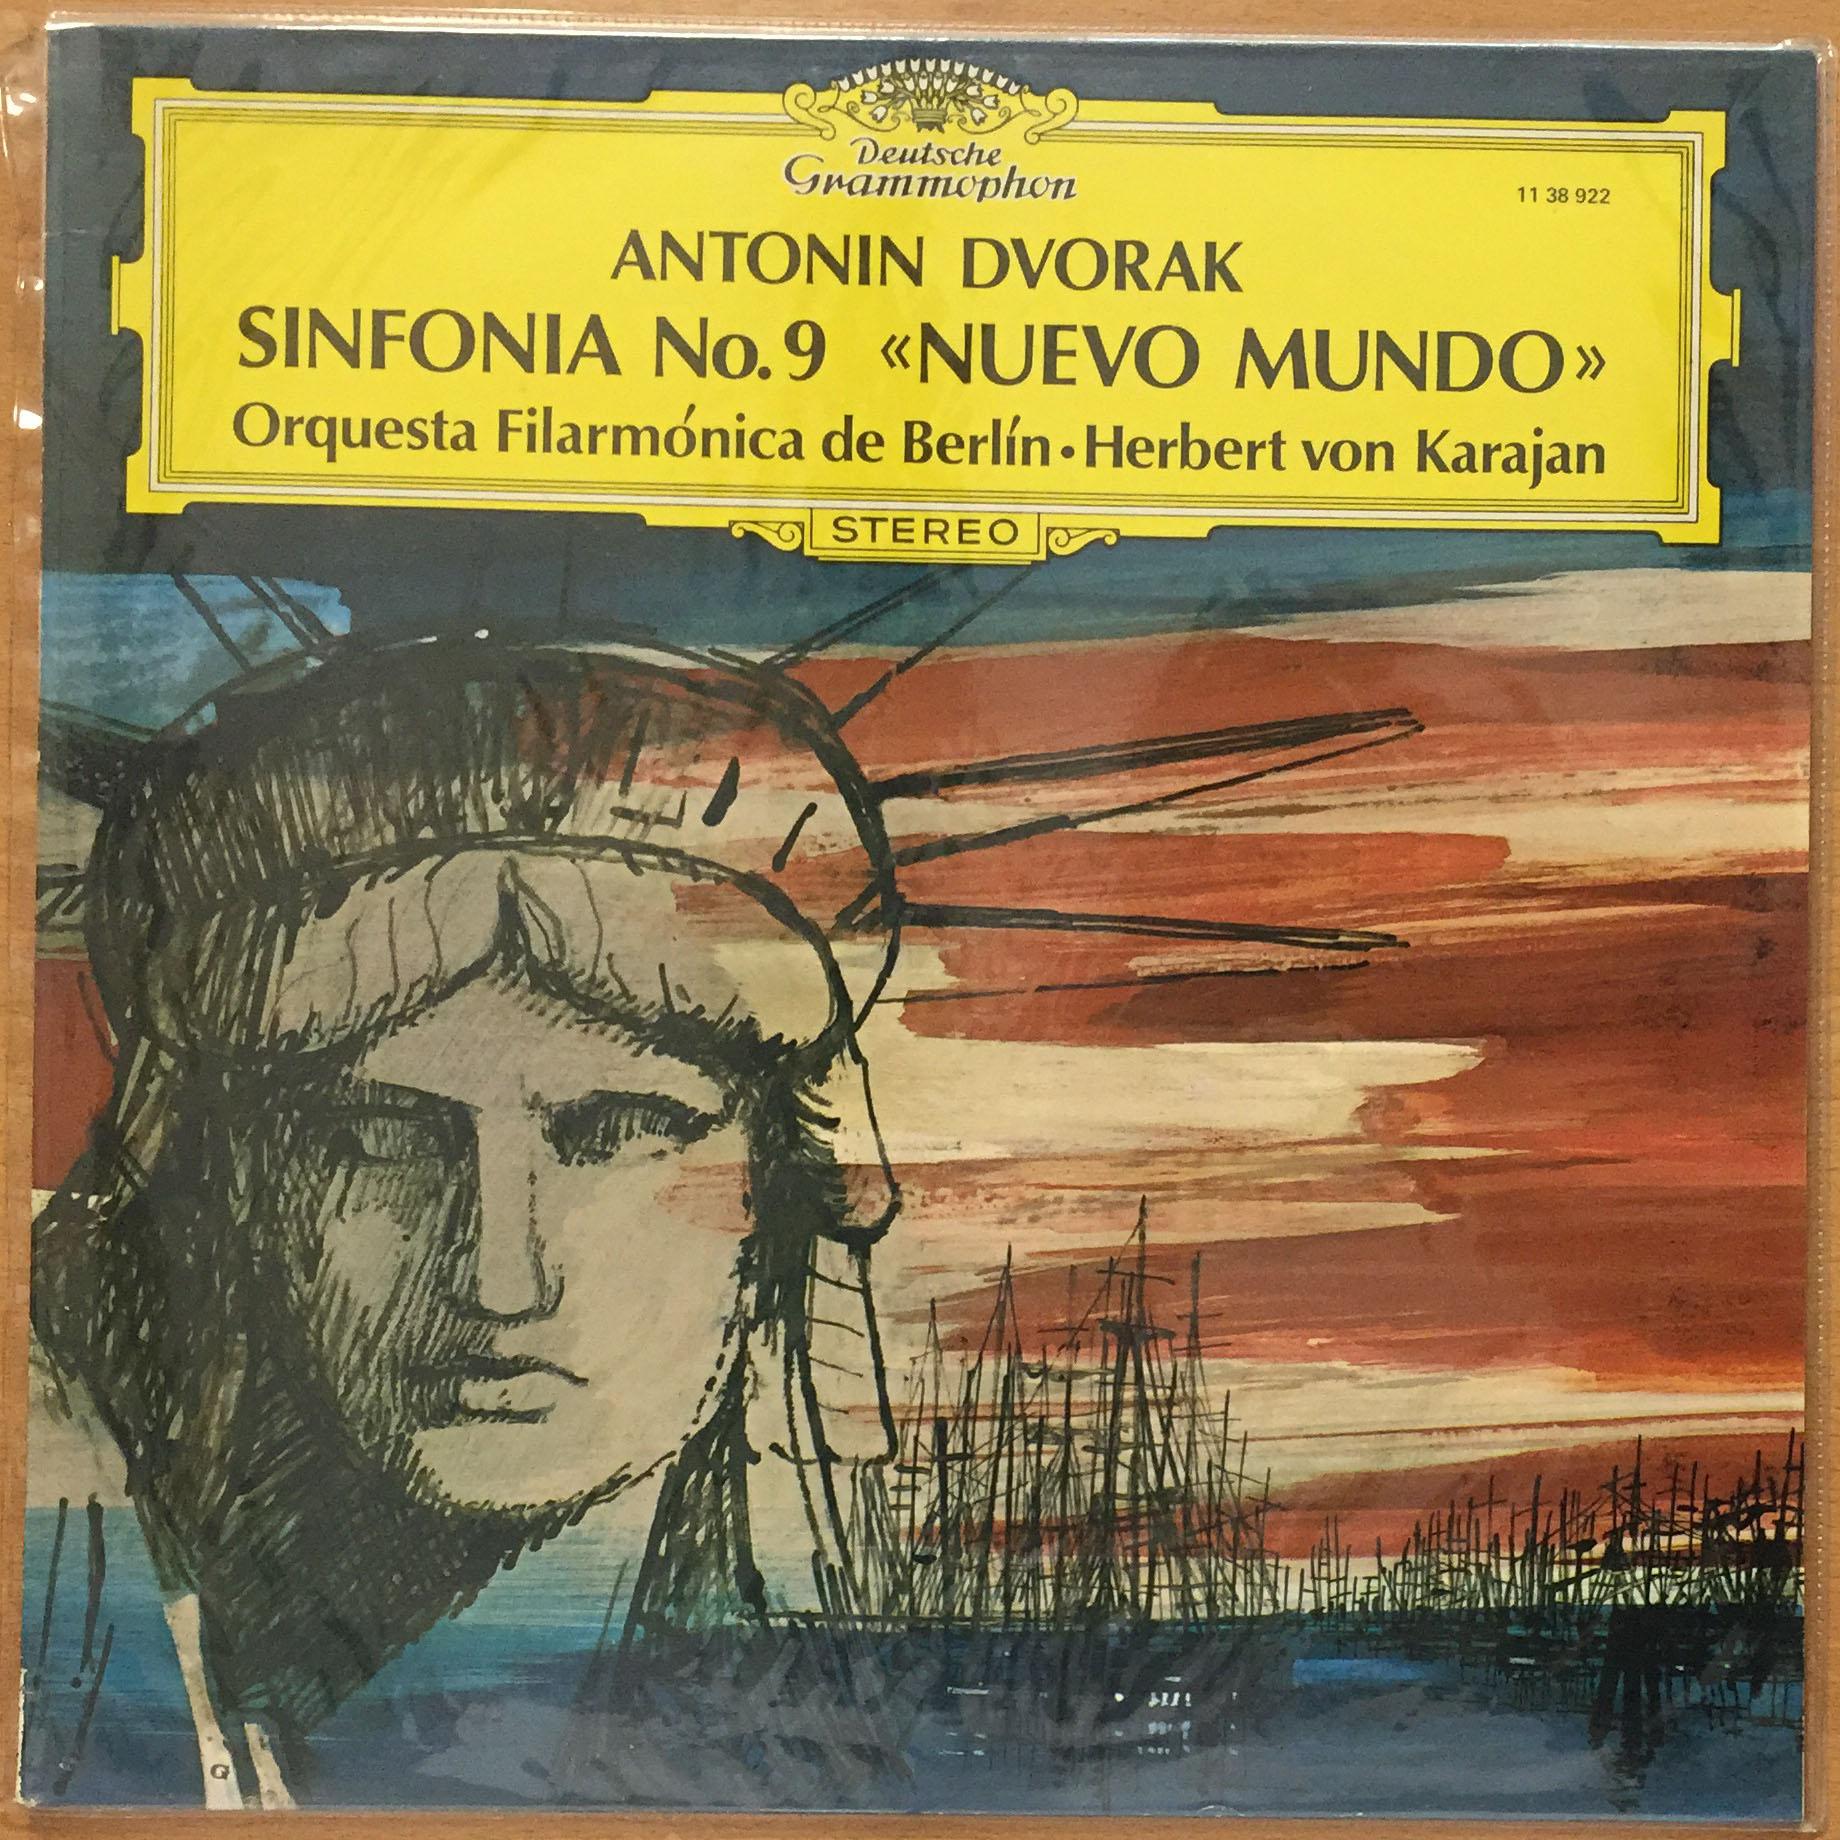 antonin dvorak sinfon'ía nº9 nuevo mundo. orquesta filarmó—nica de berl'ín & herbet von karajan